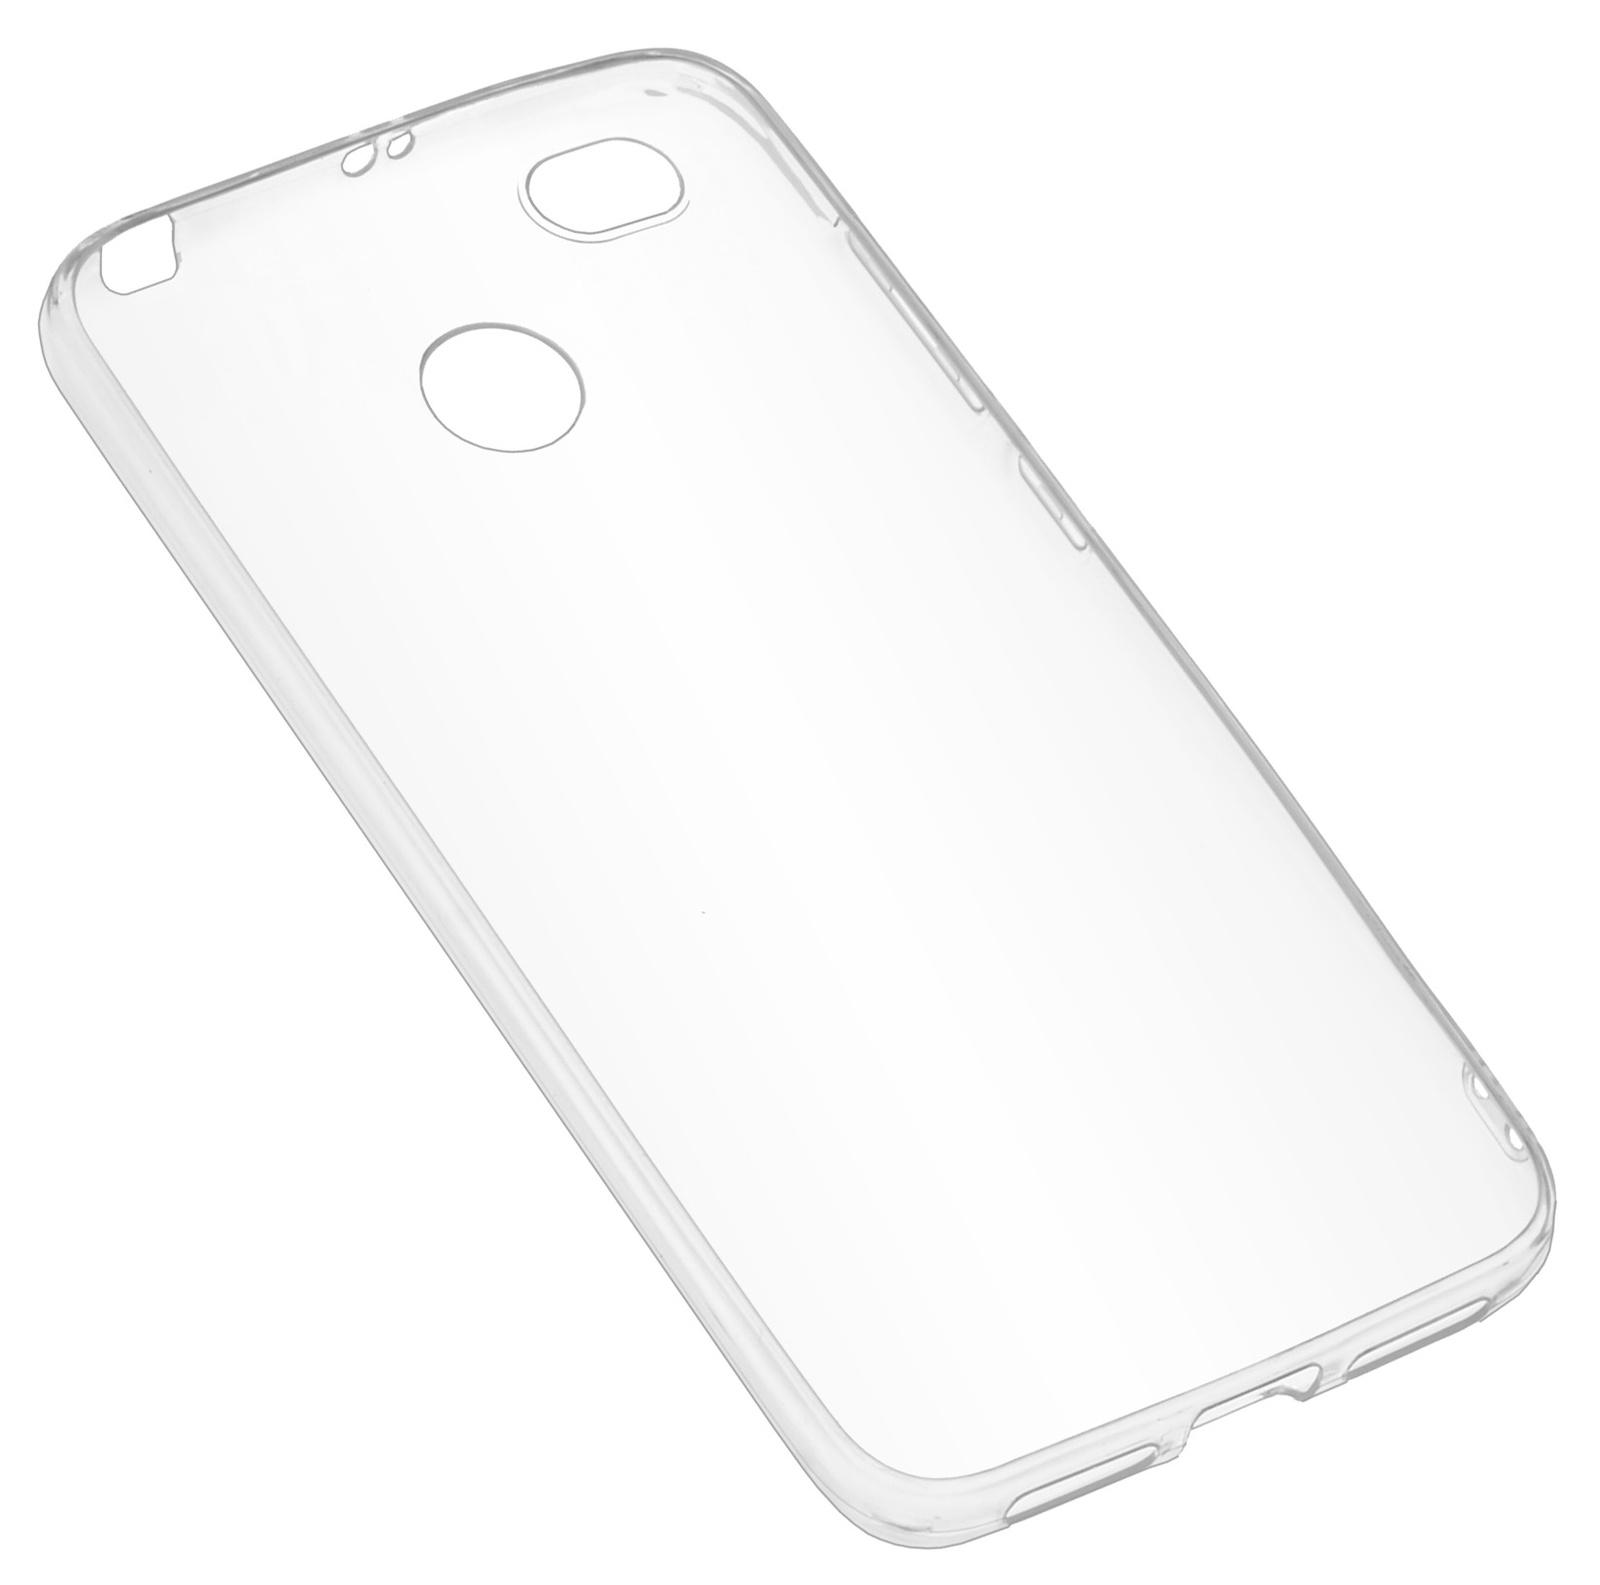 Чехол для сотового телефона skinBOX Slim Silicone, 4660041408713, прозрачный цена и фото